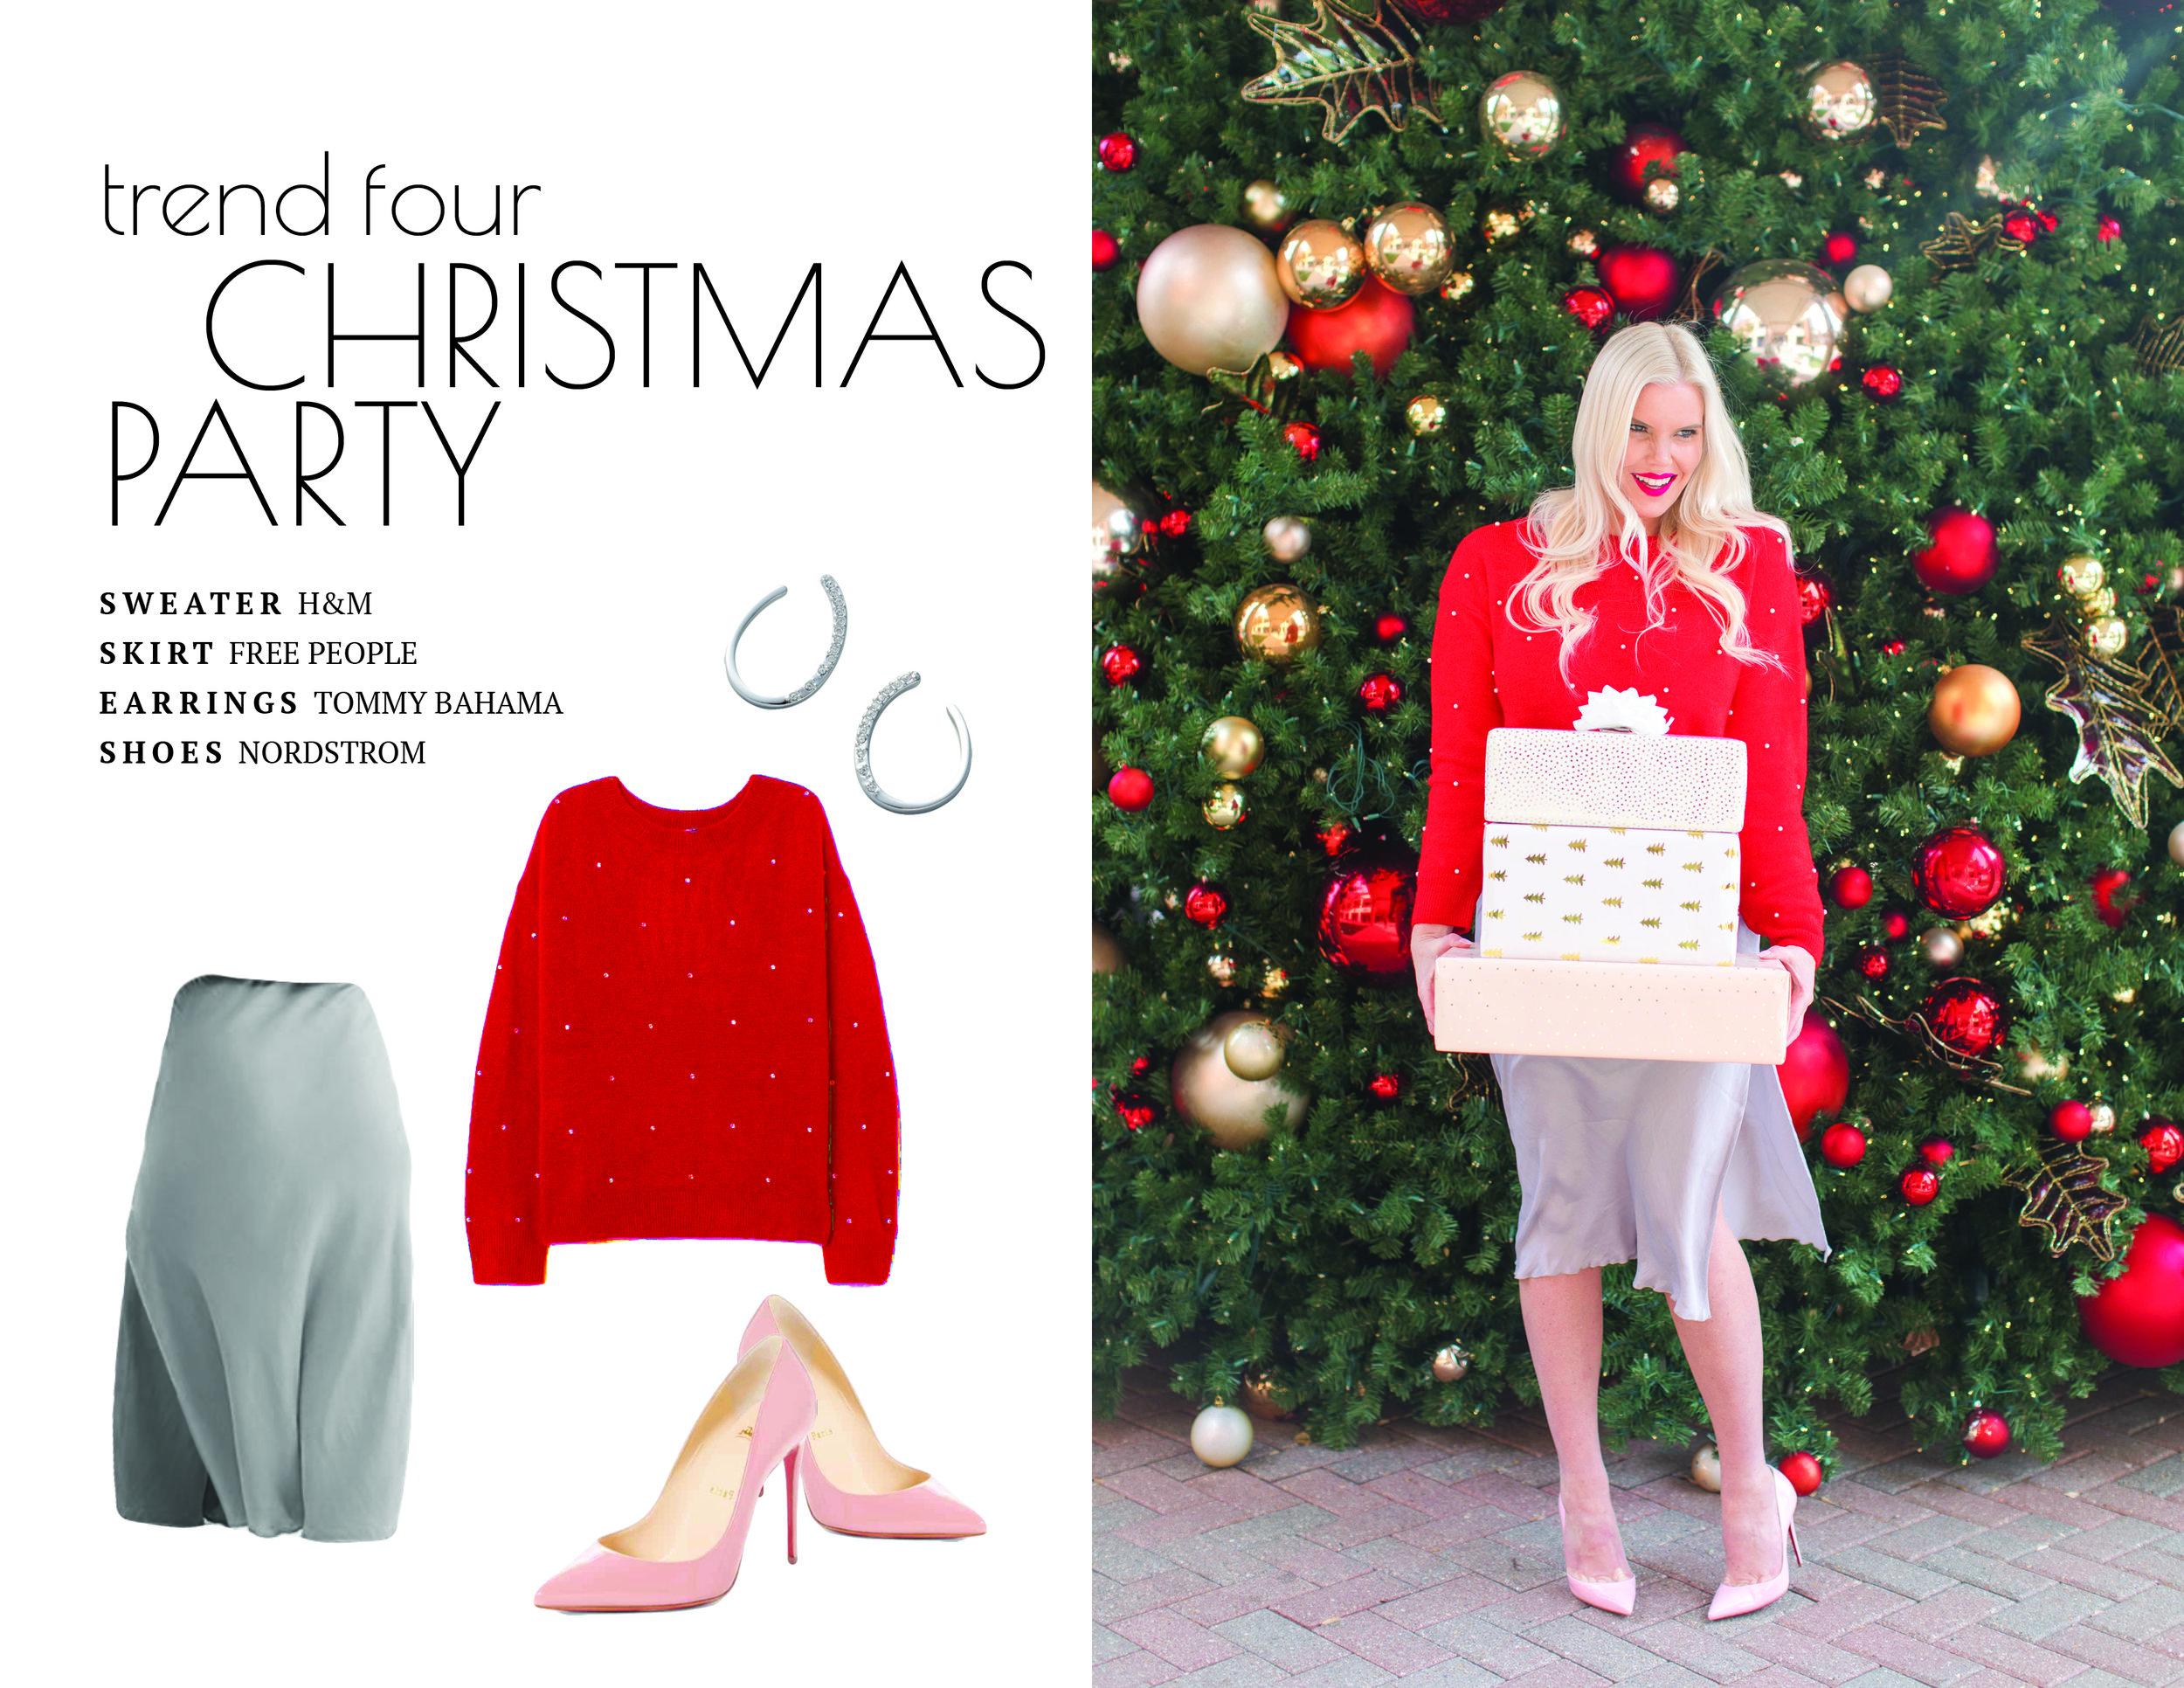 Caroline-Doll-shopping-holiday.jpg